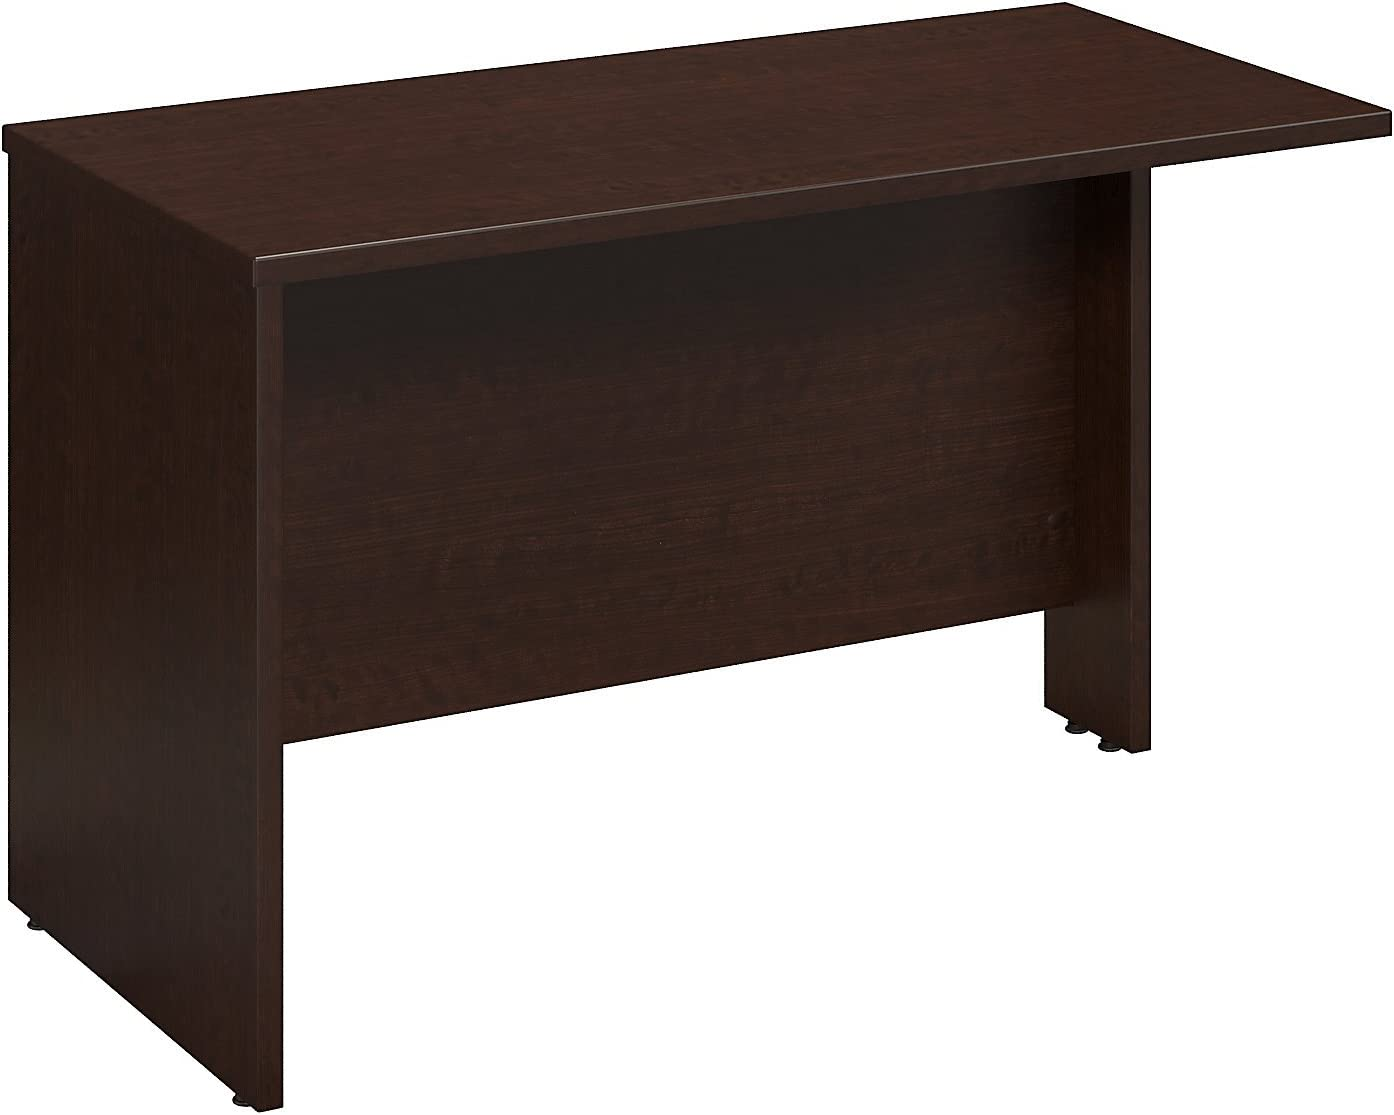 Bush Business Furniture Series C 48W x 24D Bridge/Return in Mocha Cherry